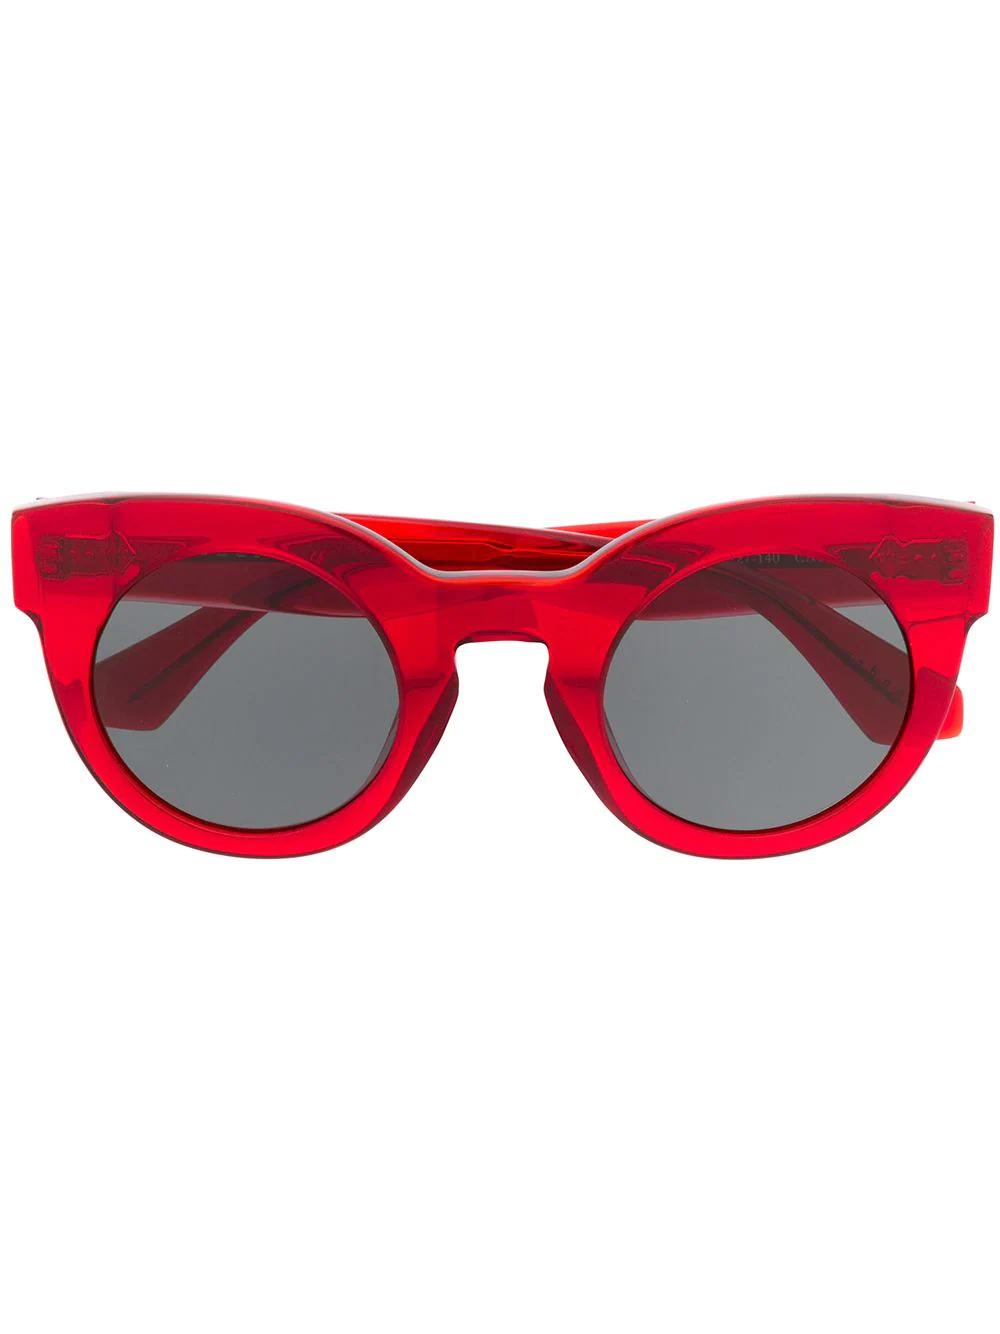 Sandro | солнцезащитные очки в оправе 'кошачий глаз' | Clouty